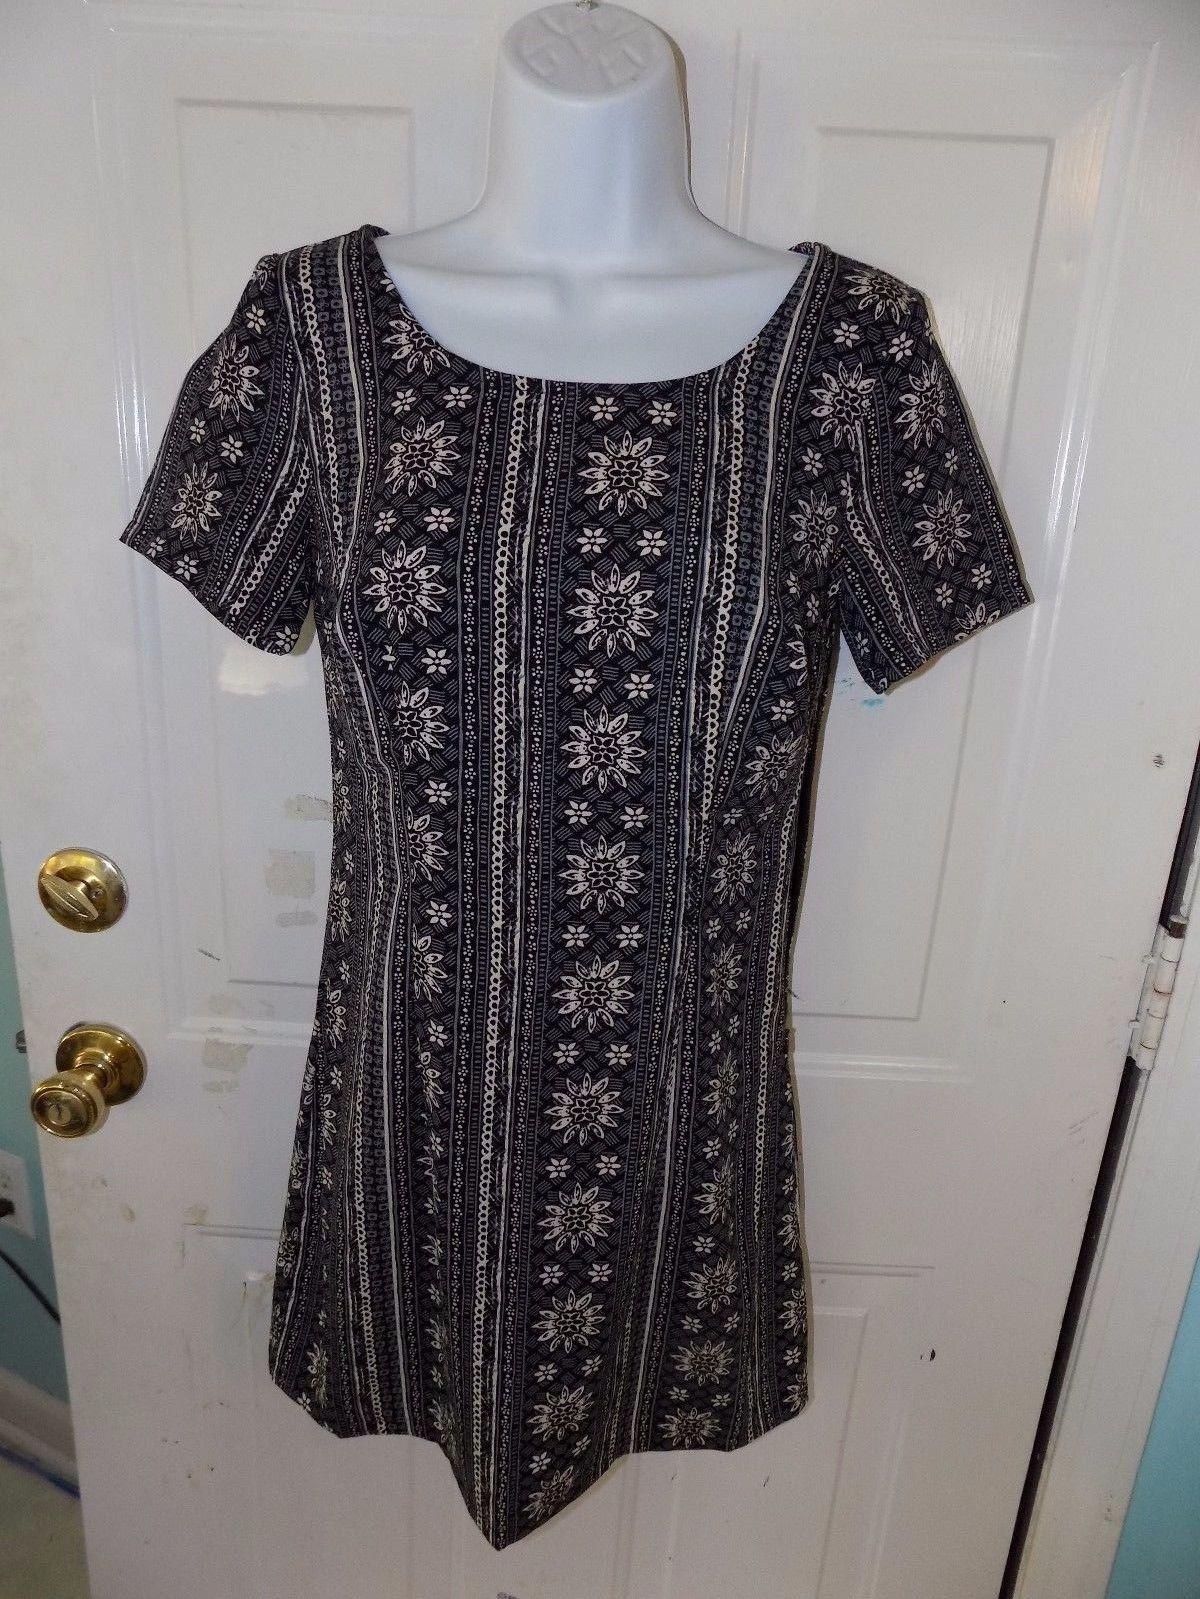 Hollister Black Mini Floral Pattern Patterned Cross-Back Dress Size XS Women's - $36.08